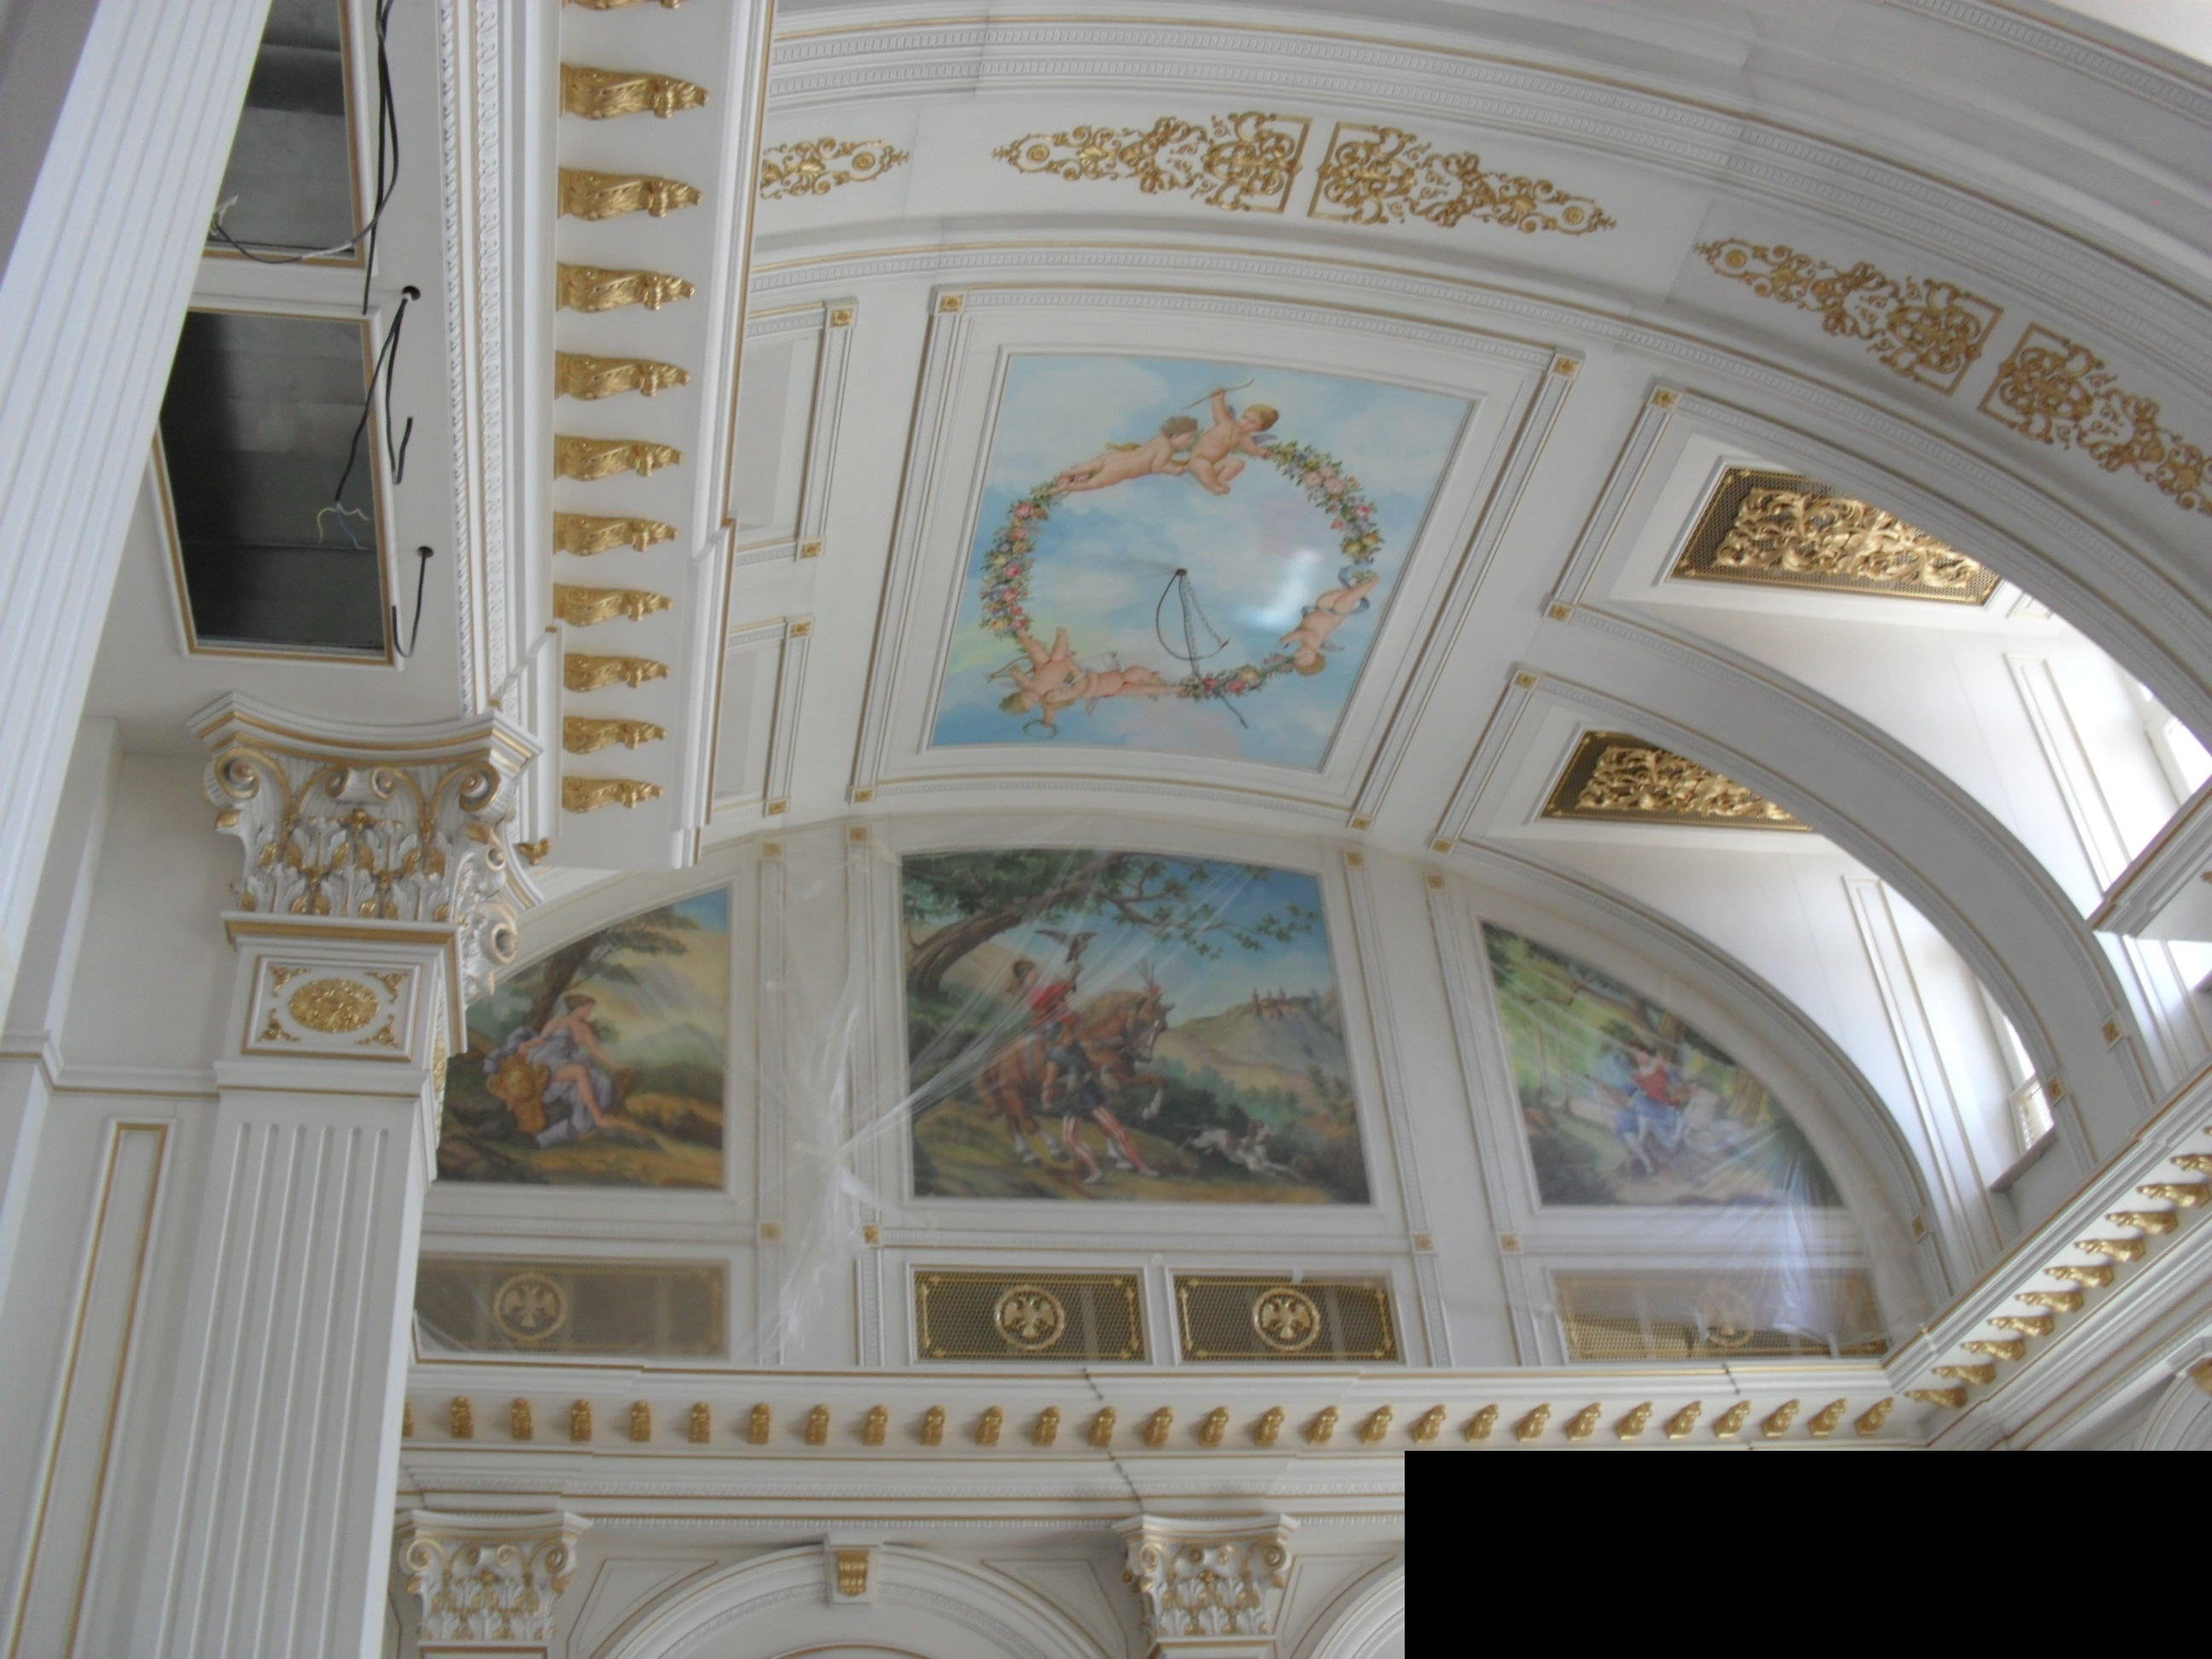 File:Putin palace interior4.jpg - Wikimedia Commons